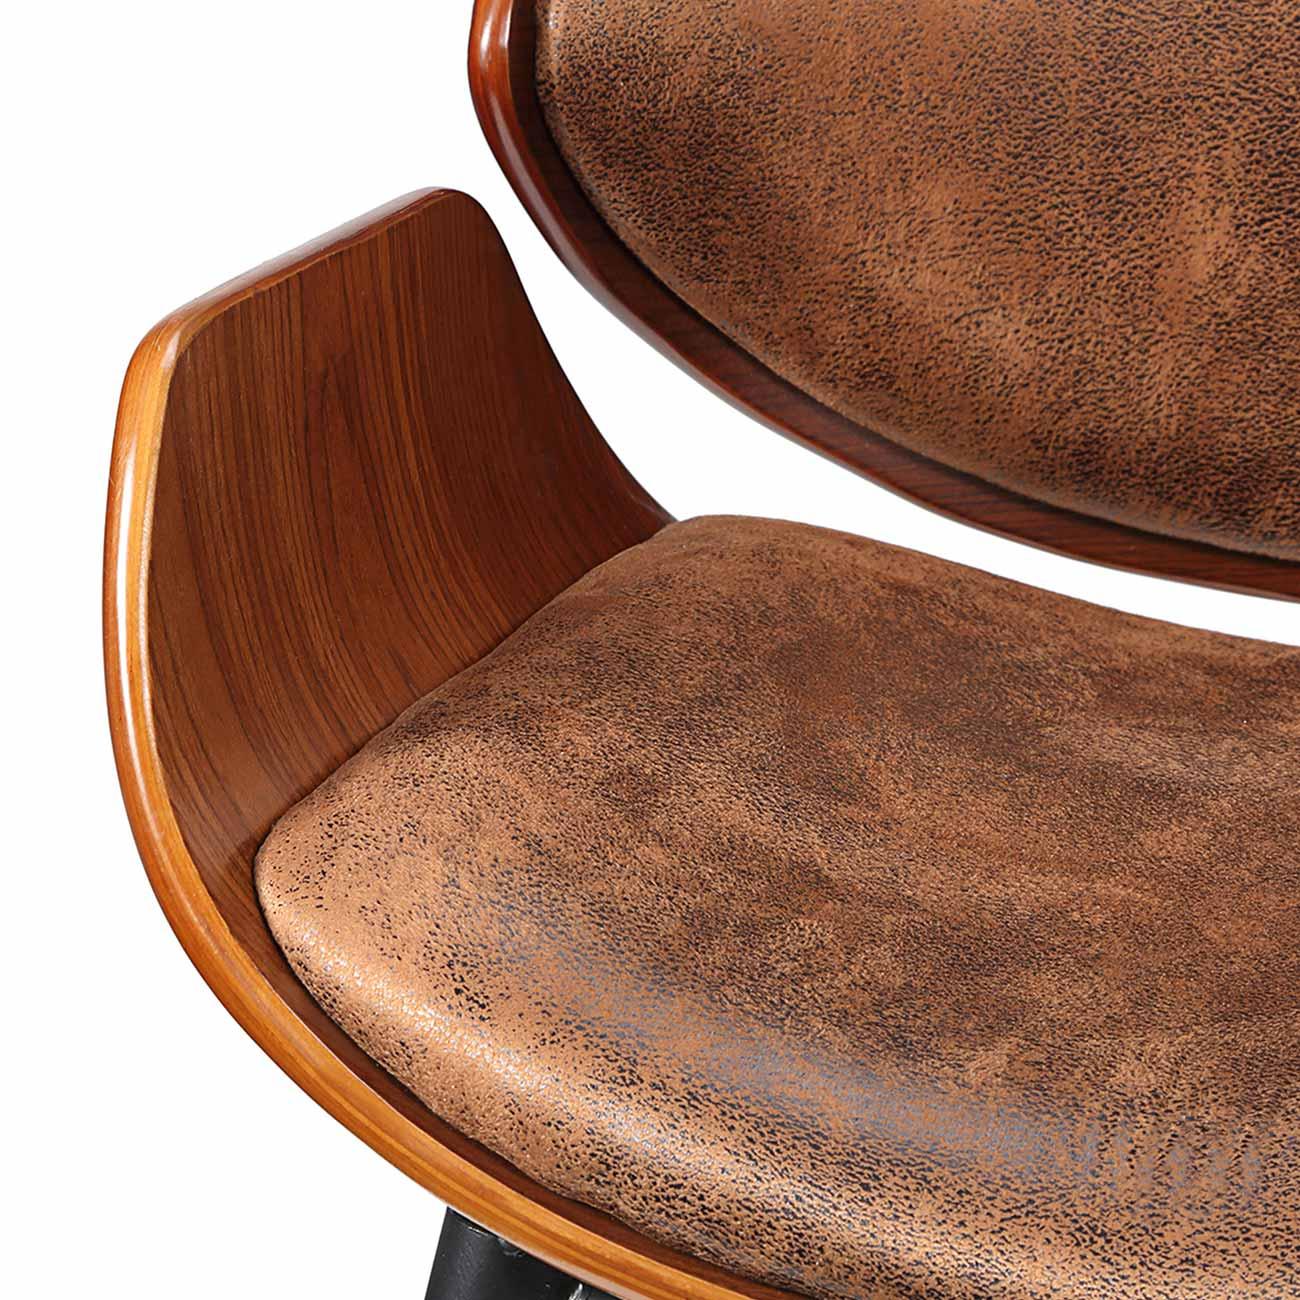 Sedia Retro Vintage Design Moderna Imbottita Ecopelle Legno Massello ...